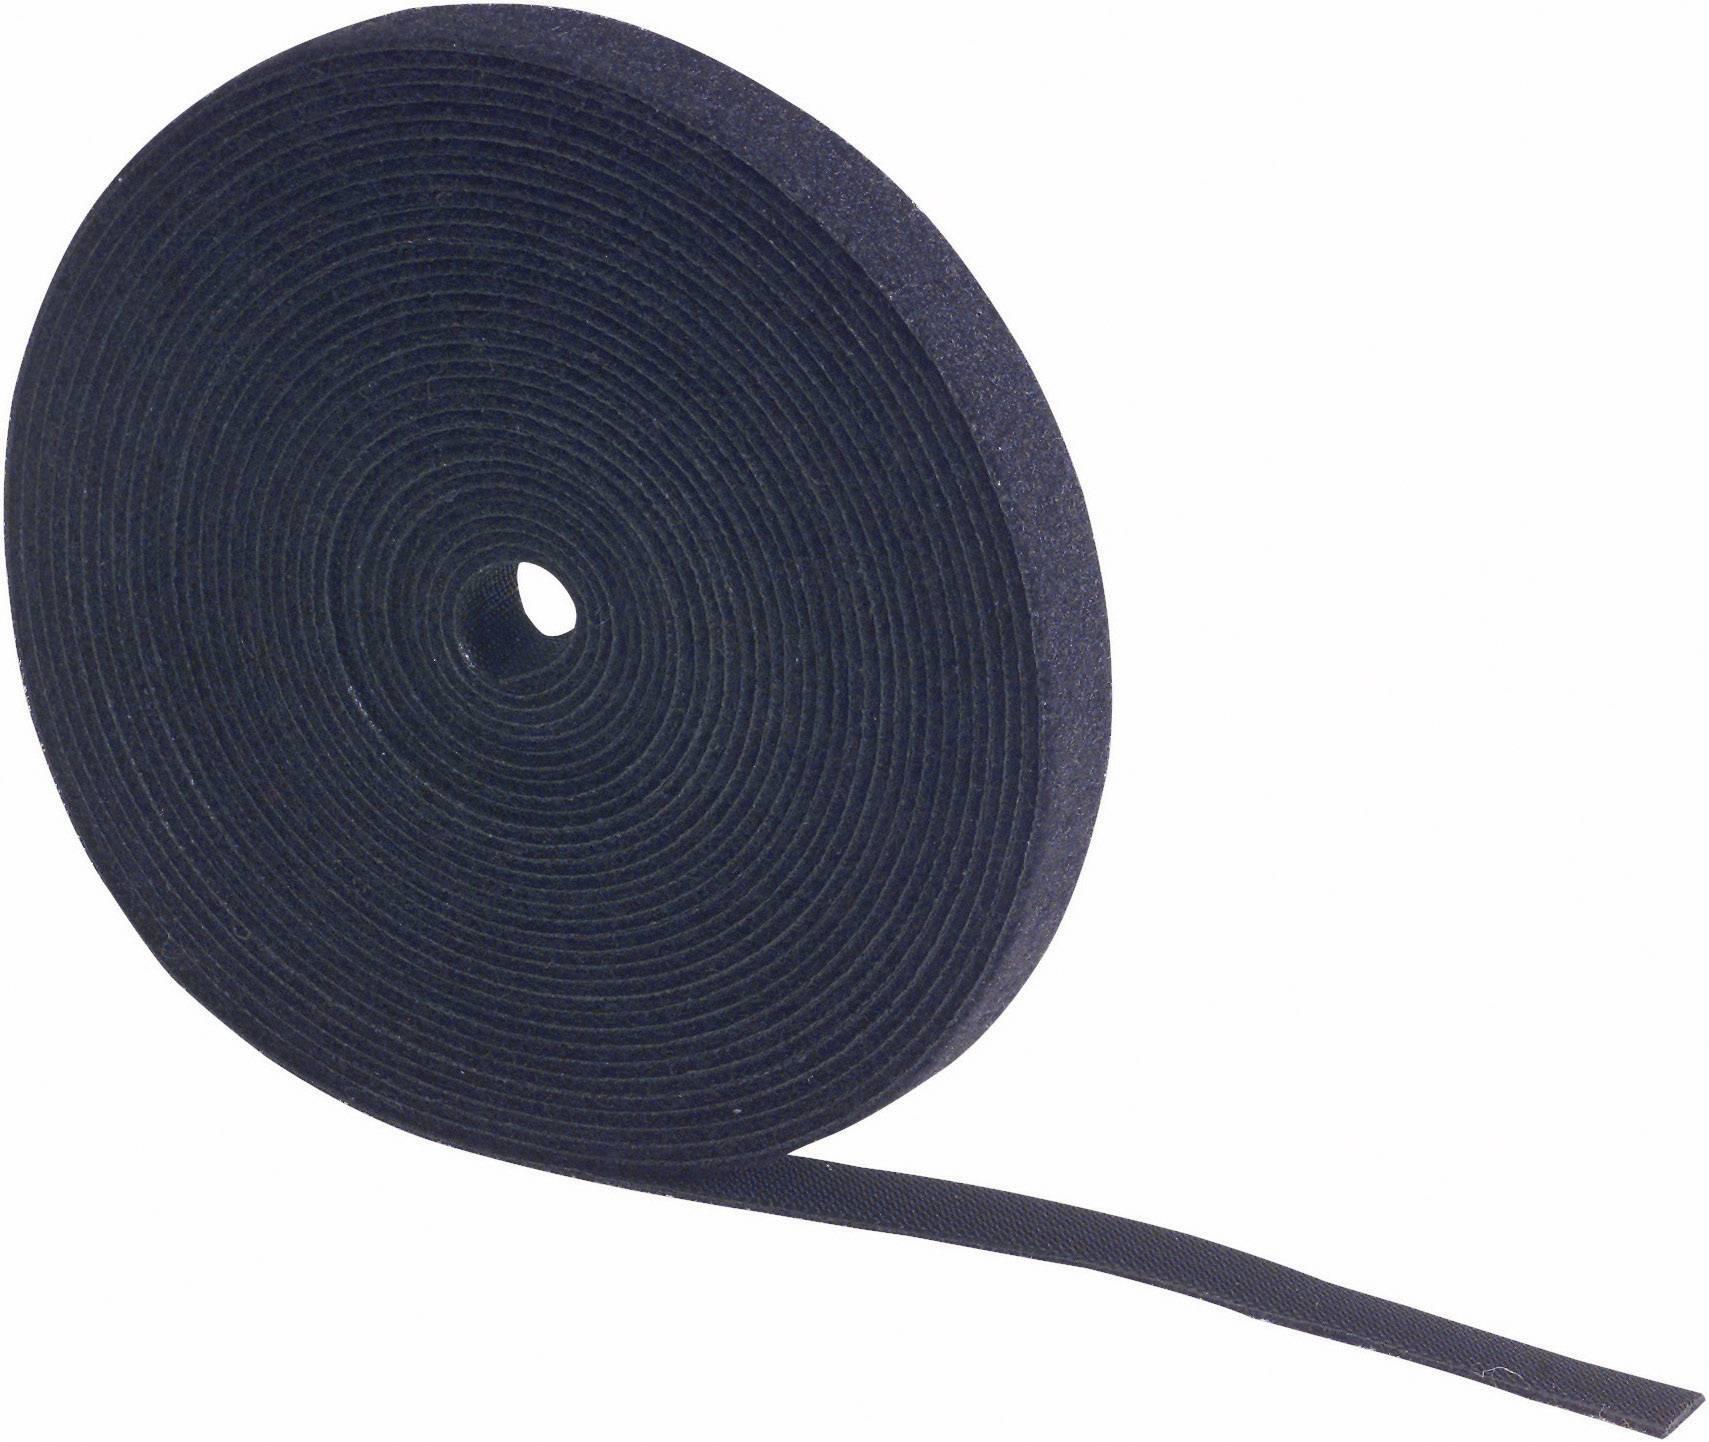 Páska se suchým zipem, Fastech 697-330C, černá, 5 m x 20 mm